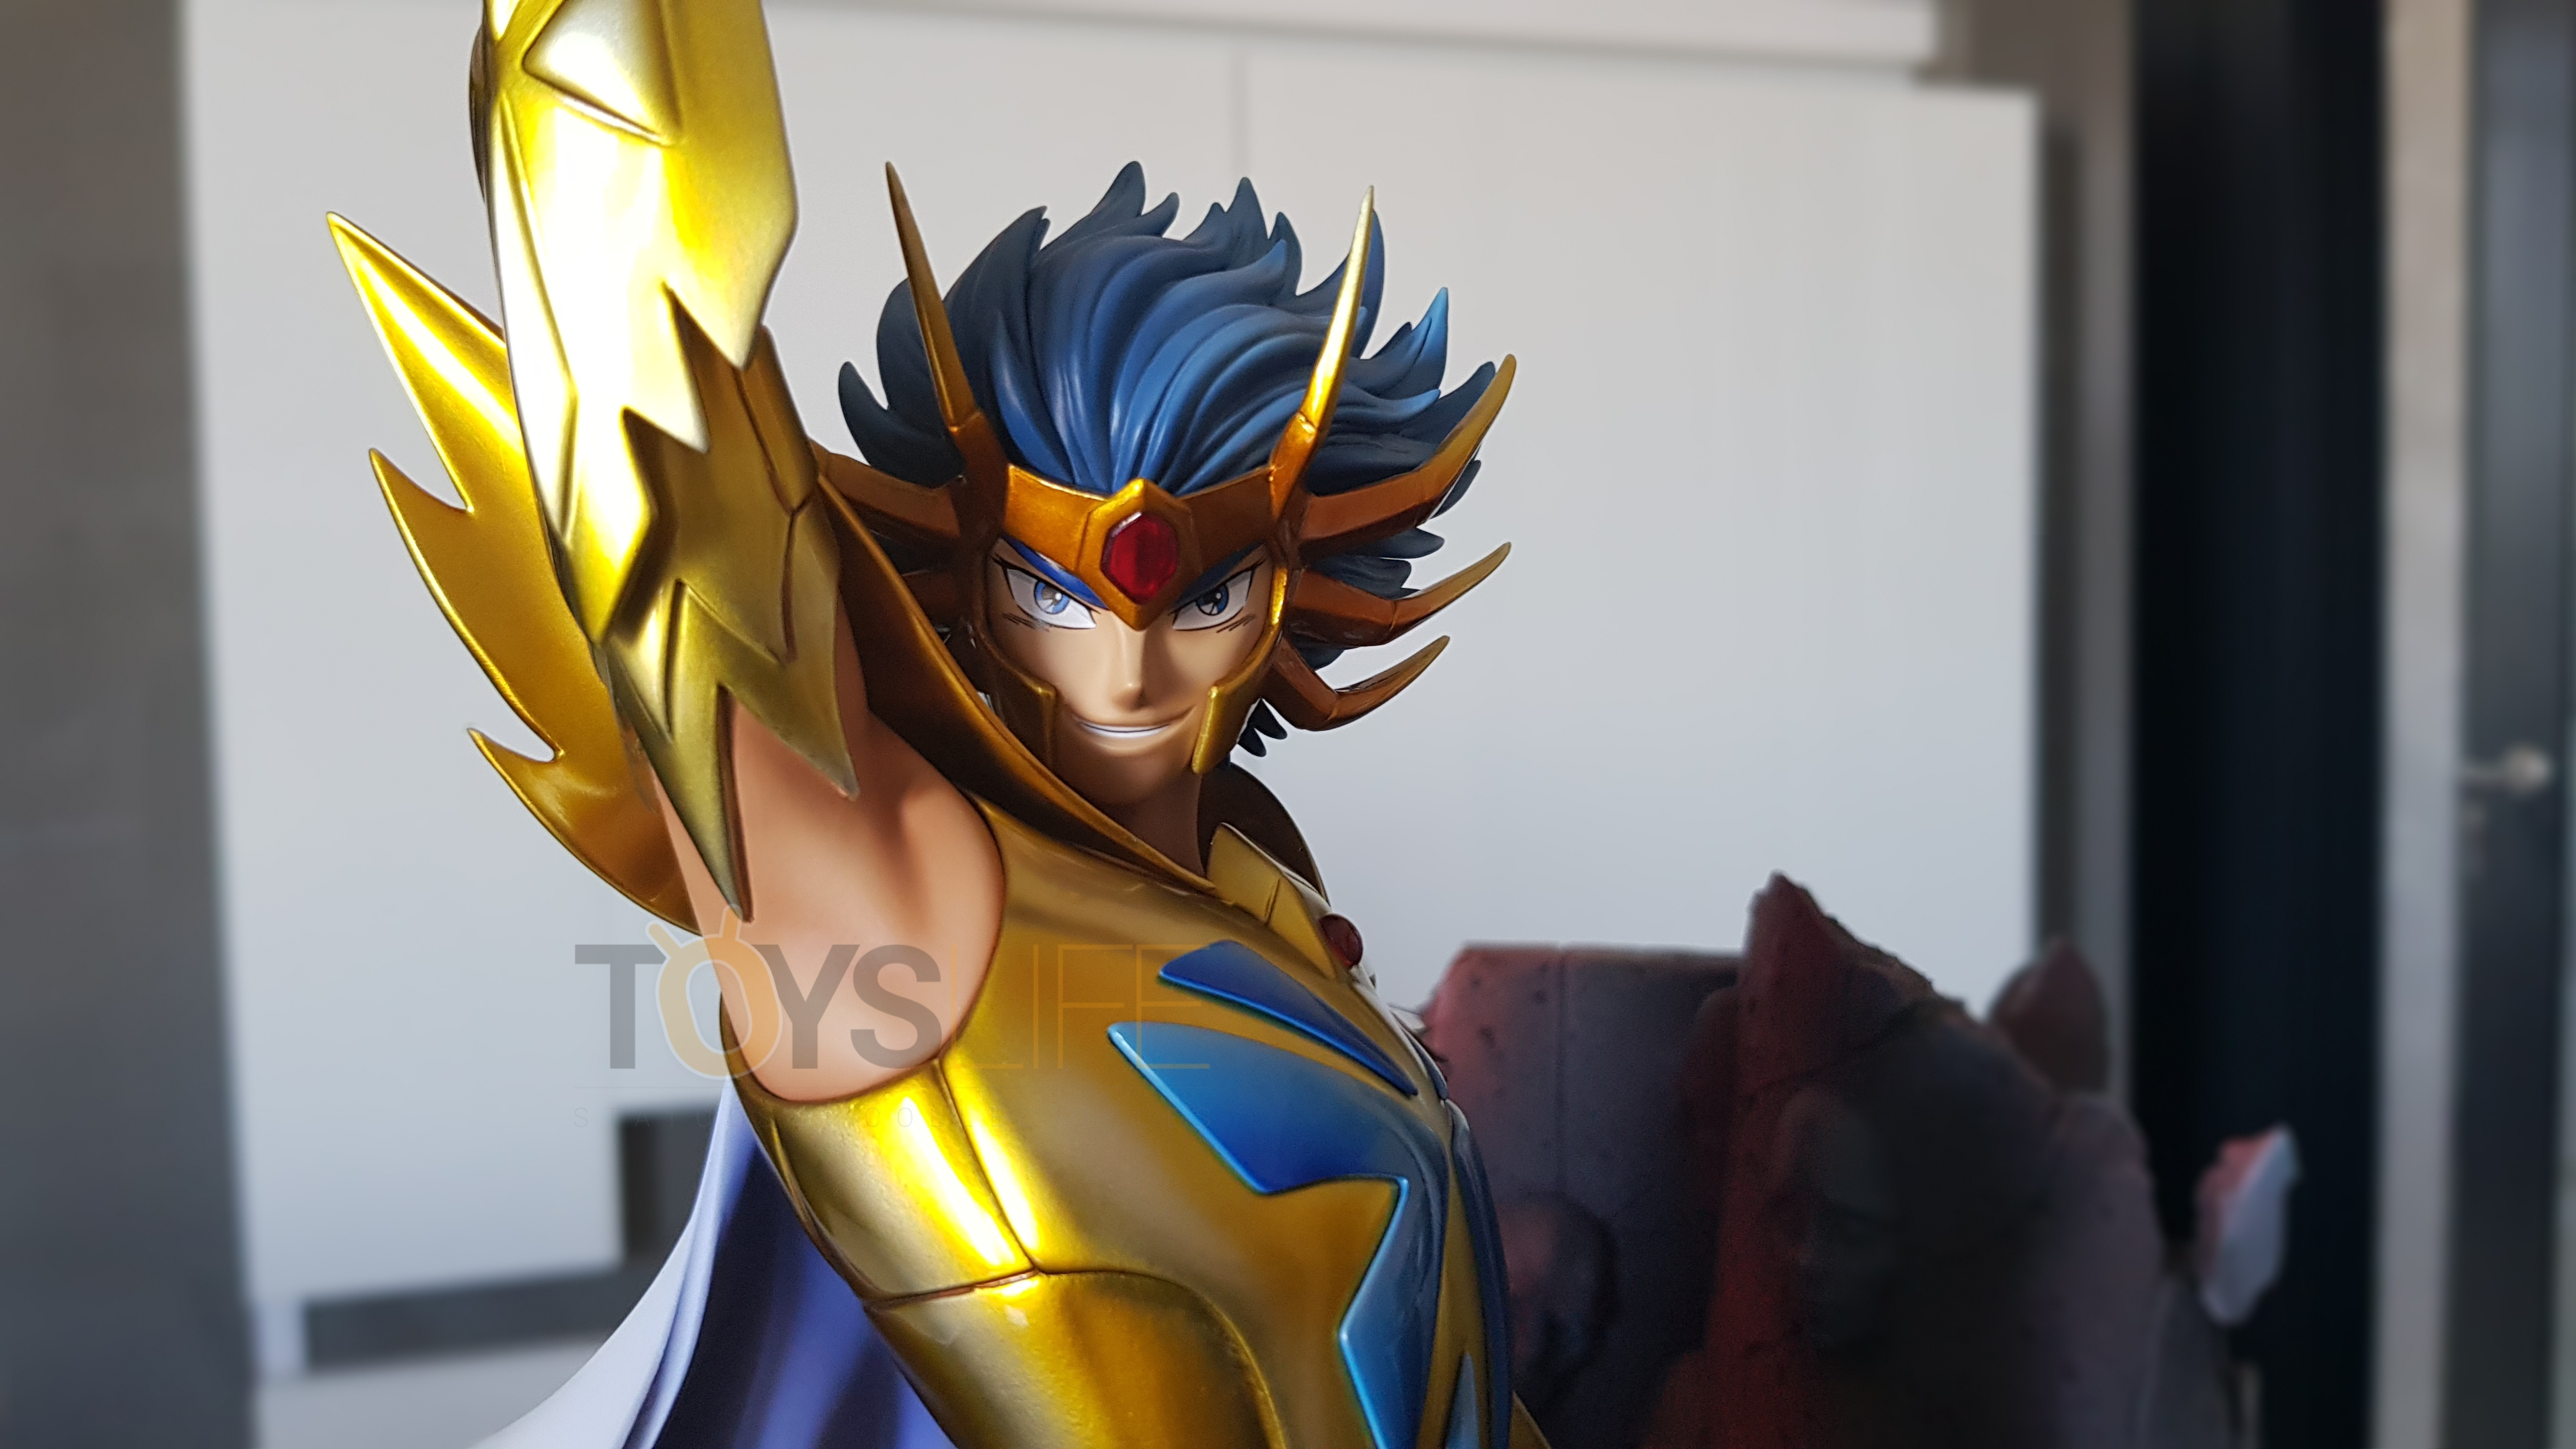 tsume-art-saint-seiya-gold-saint-death-mask-statue-toyslife-review-08